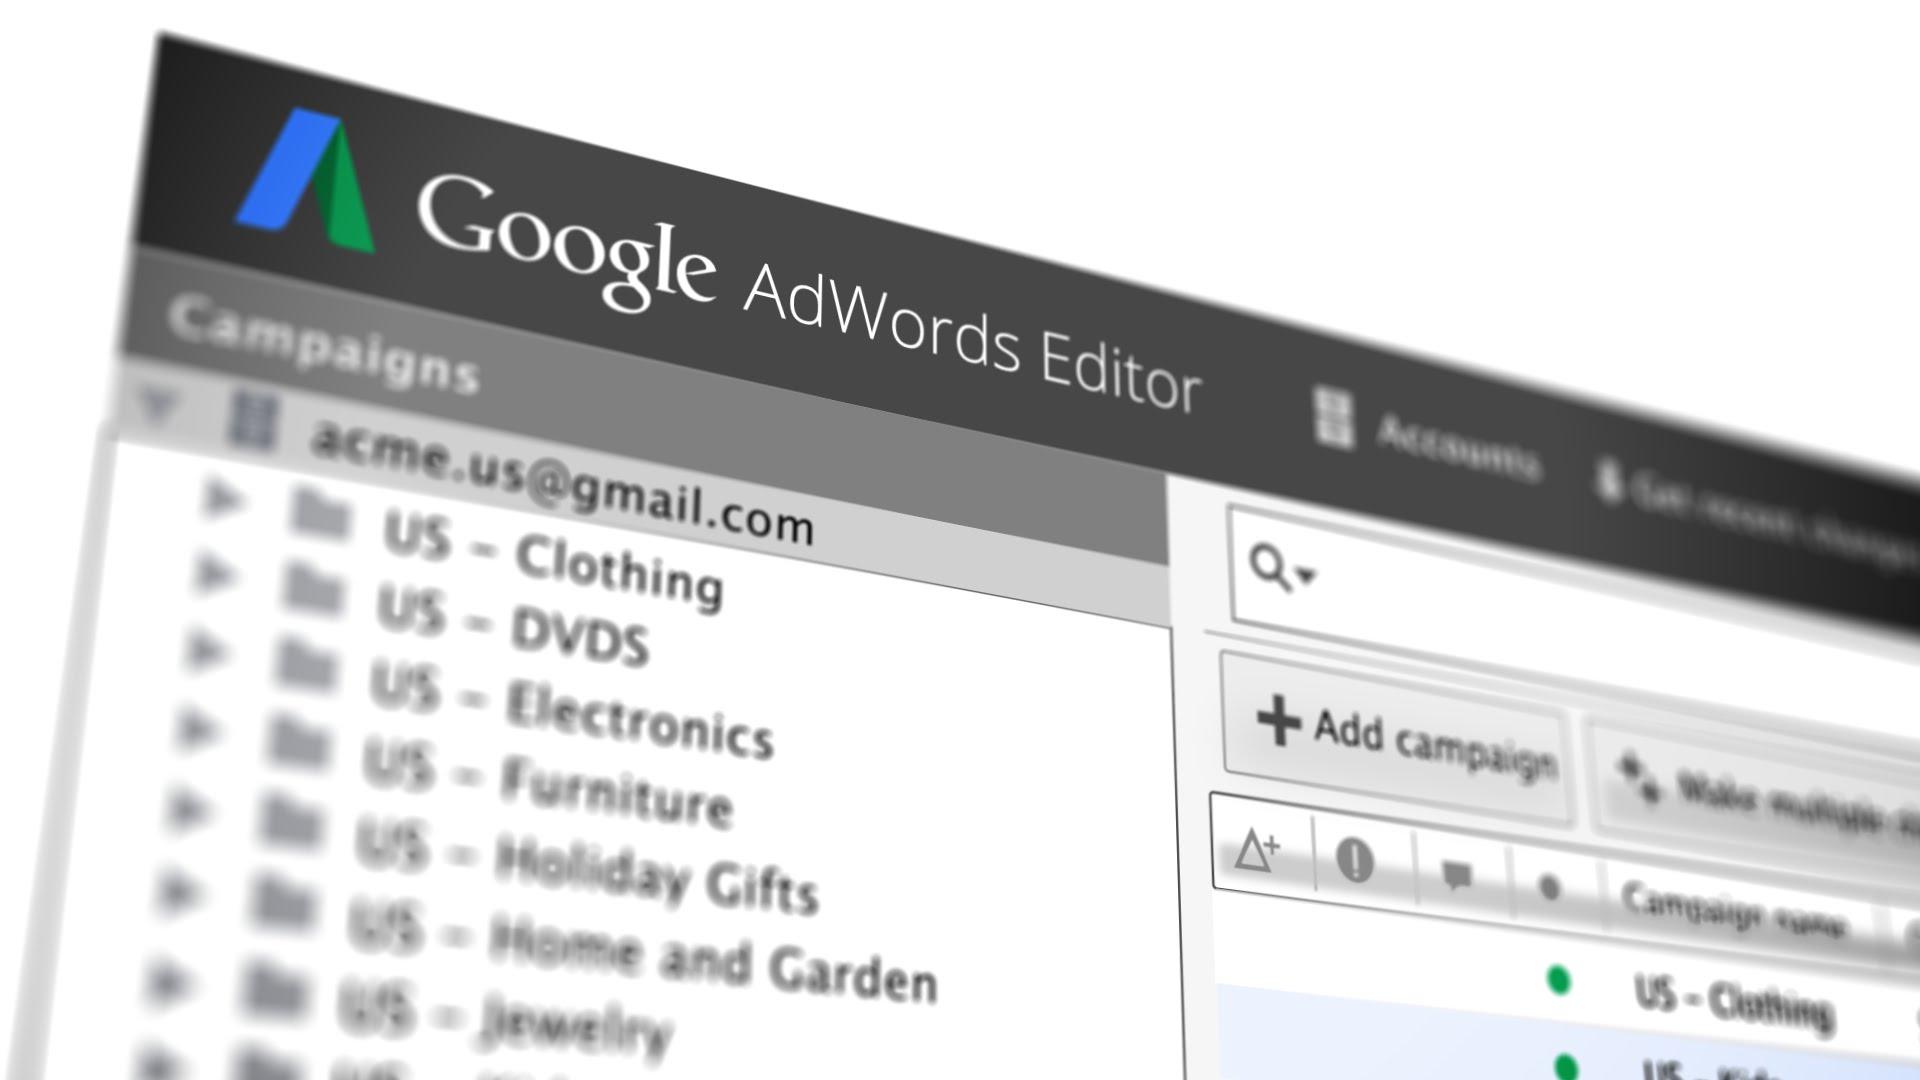 Google Cập Nhật Awrods Editor 11.3